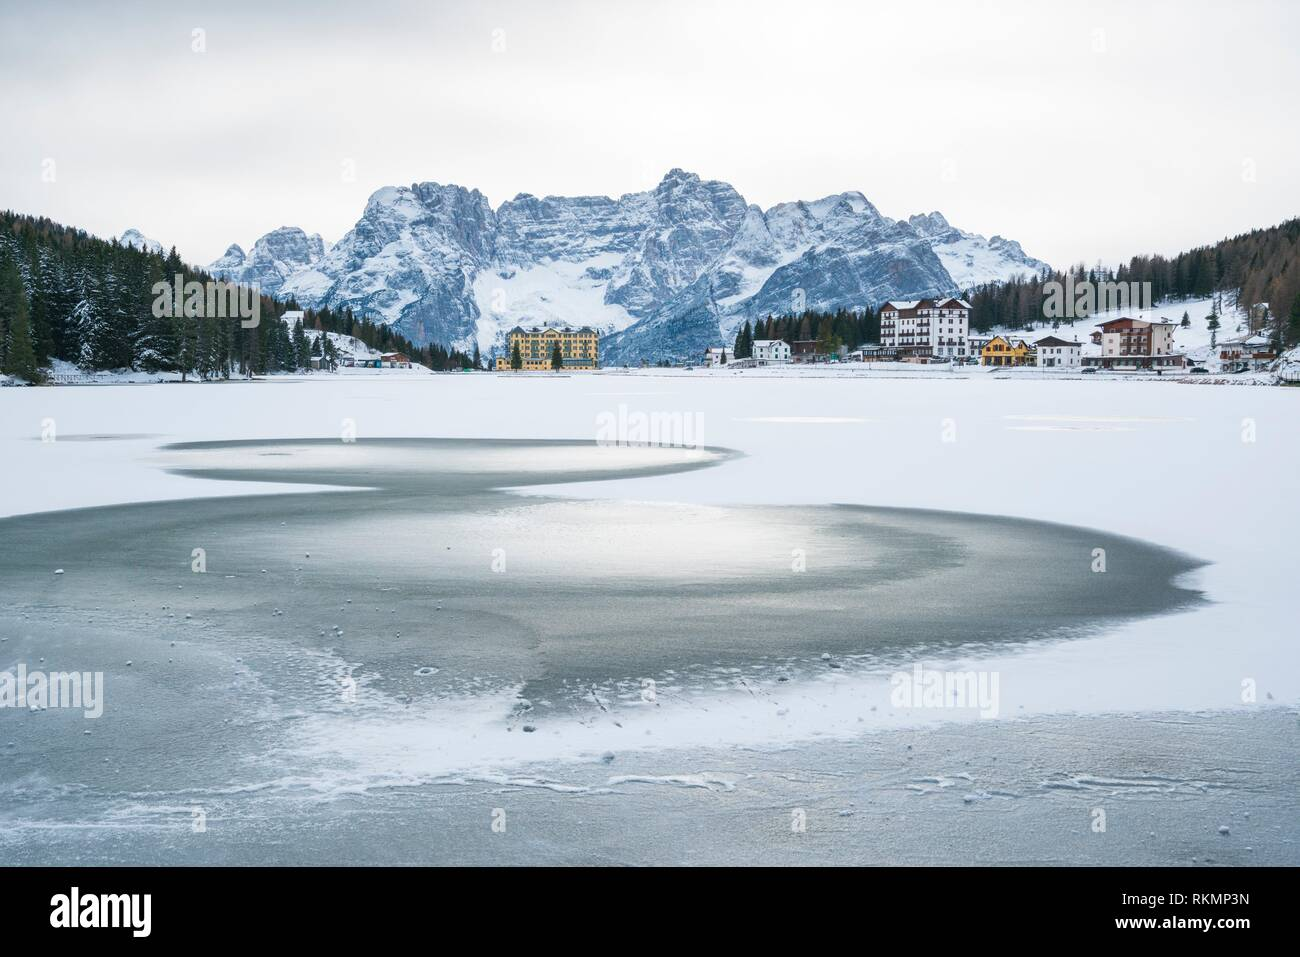 Lake Misurina, Belluno province, Dolomites, Unesco World Heritage Site, Italy, Europe. - Stock Image